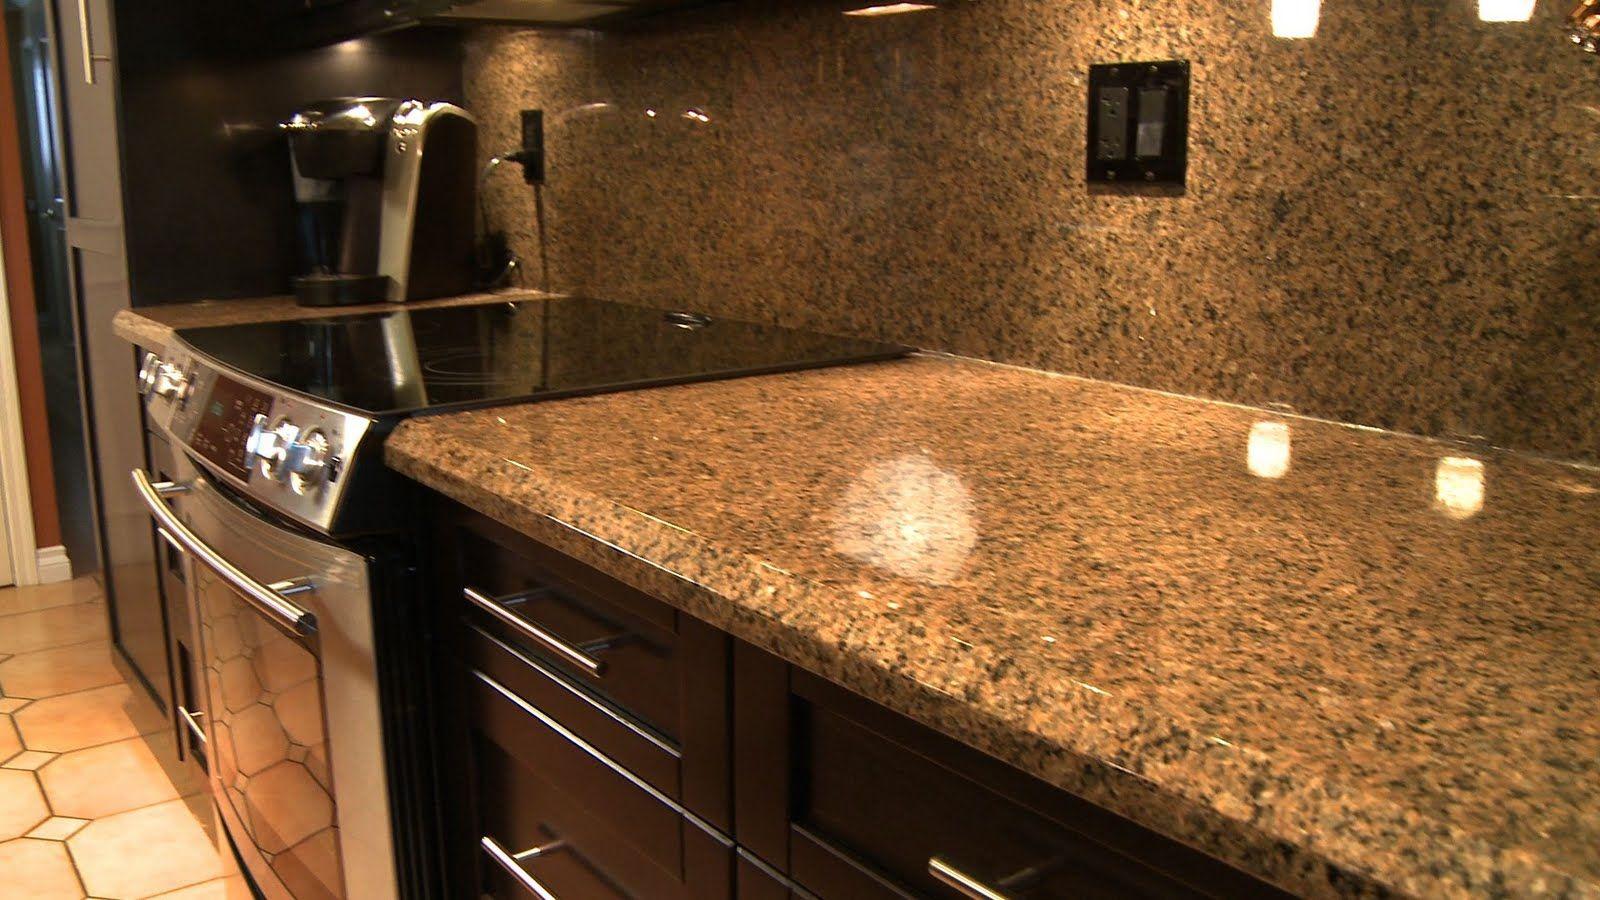 calgary granite countertops kitchen granite countertops 17 Best Images About Countertop Ideas On Pinterest Silestone